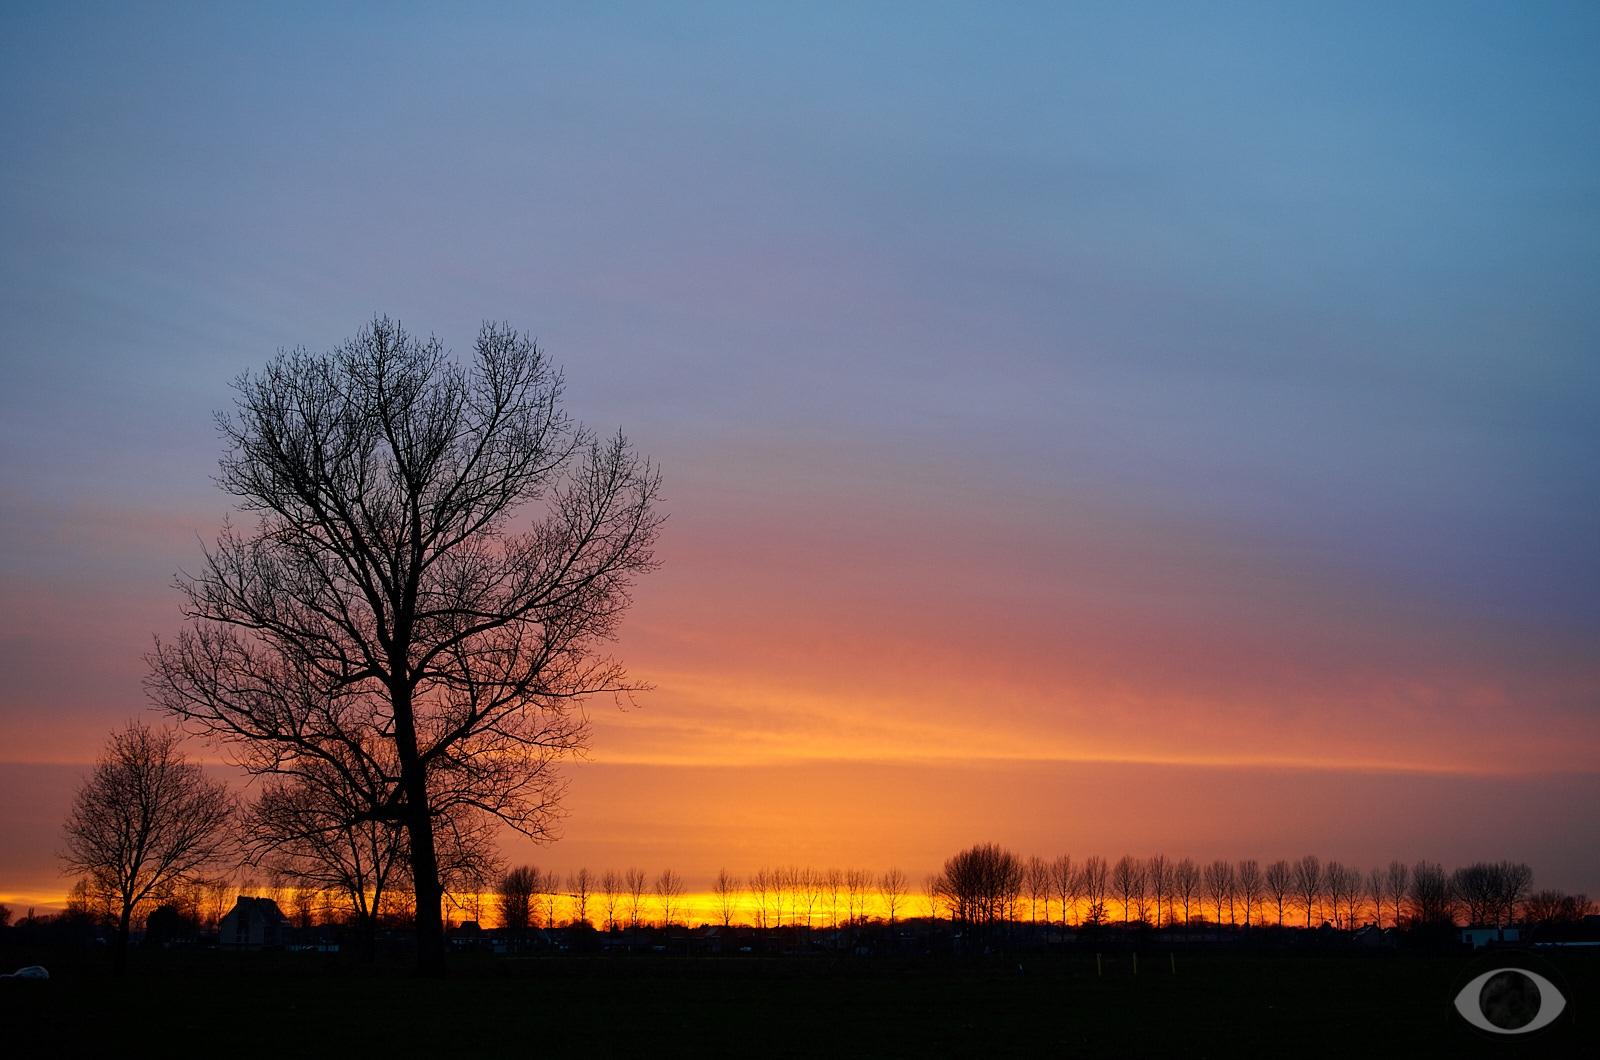 Sunset. nice sunset happened wa - pentaxke | ello